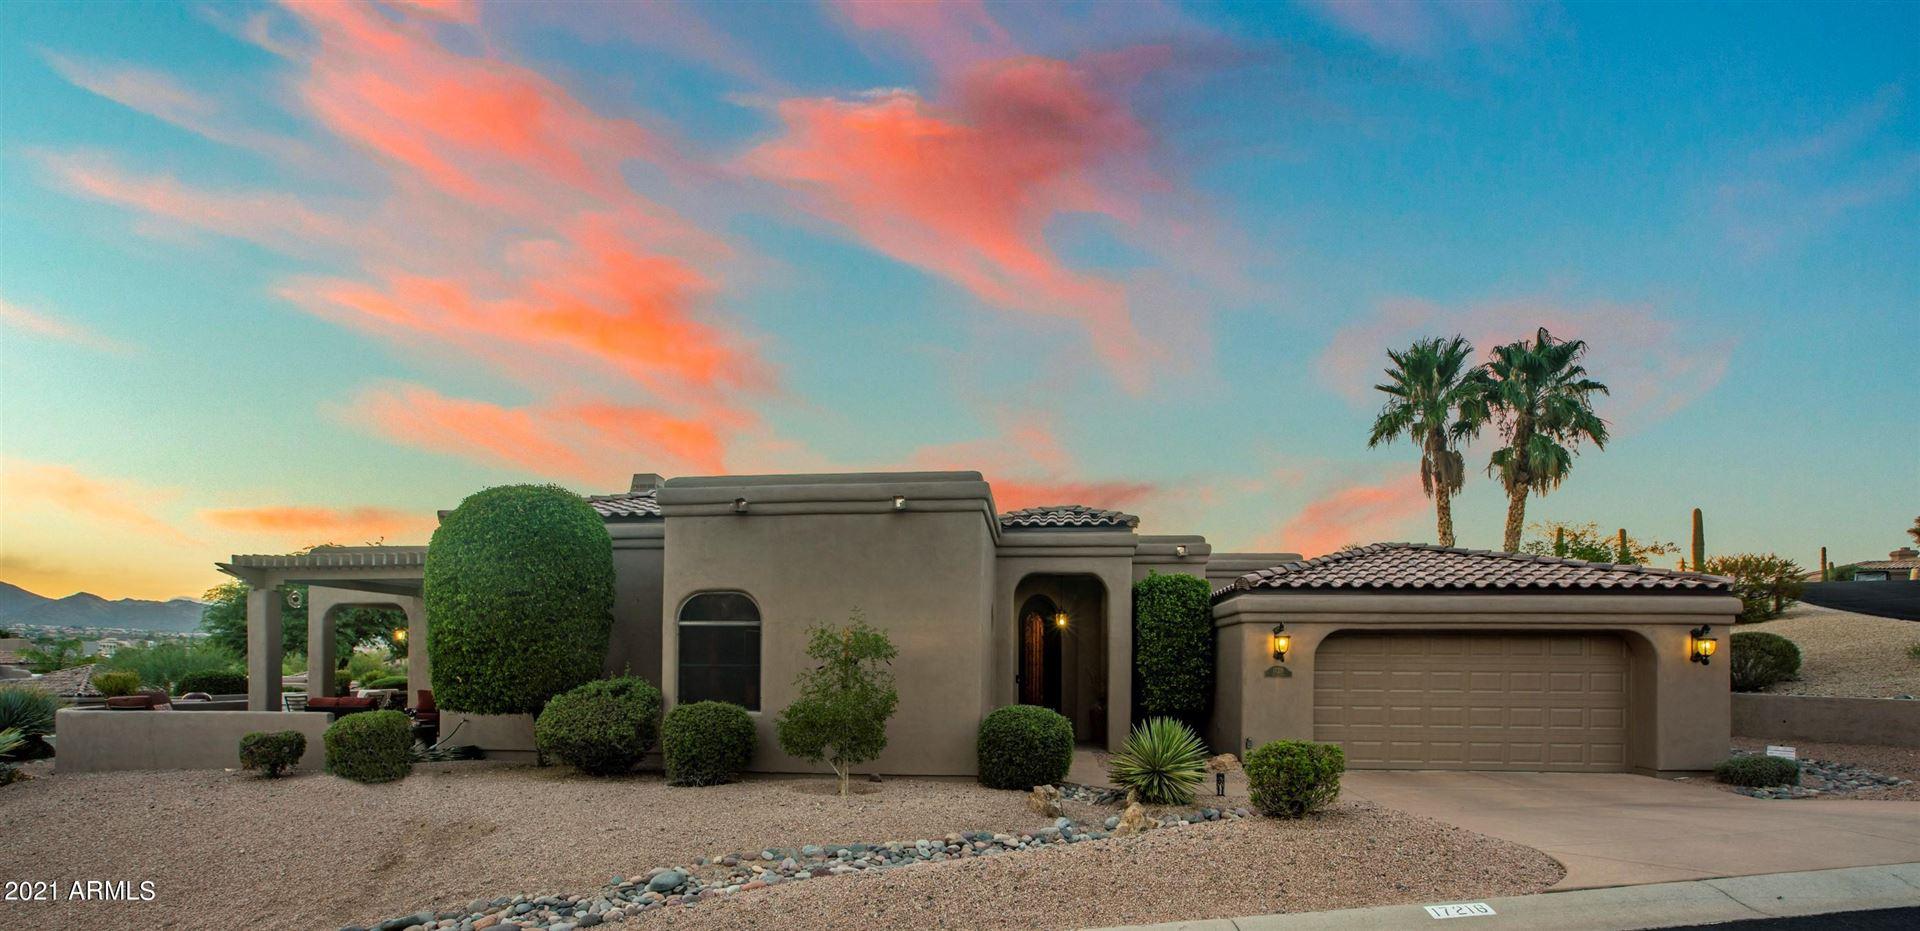 Photo of 17216 E Alta Loma Drive, Fountain Hills, AZ 85268 (MLS # 6266407)